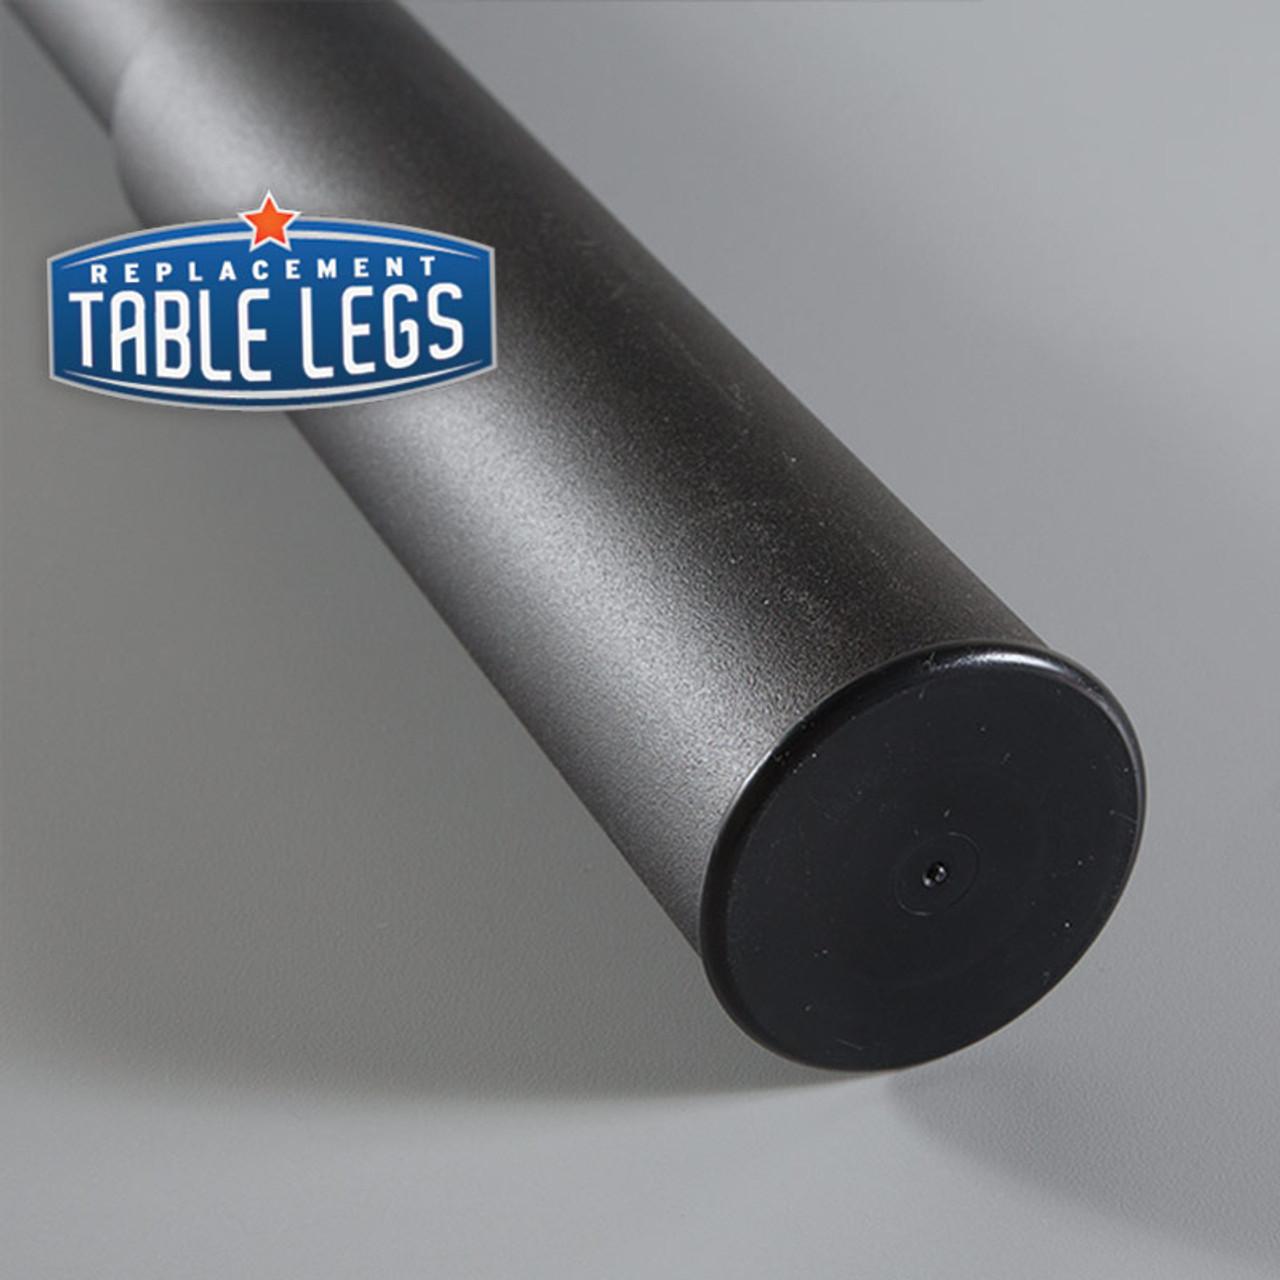 Black Matte Studio Telescoping Table Leg foot detail - replacementtablelegs.com